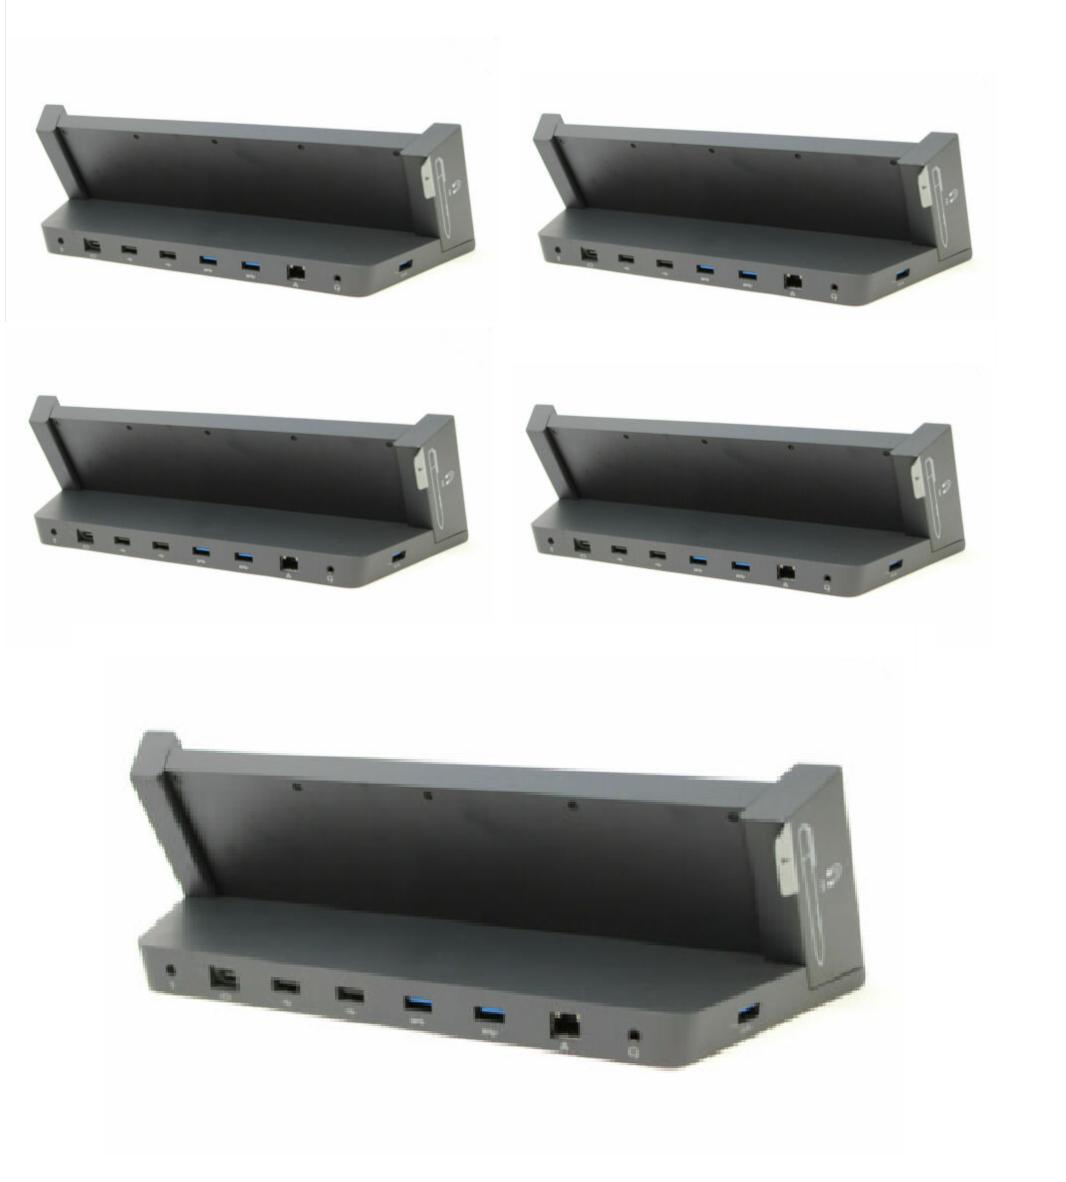 Lot 5 x microsoft surface pro docking station model 1664 for pro 3 & pro 4